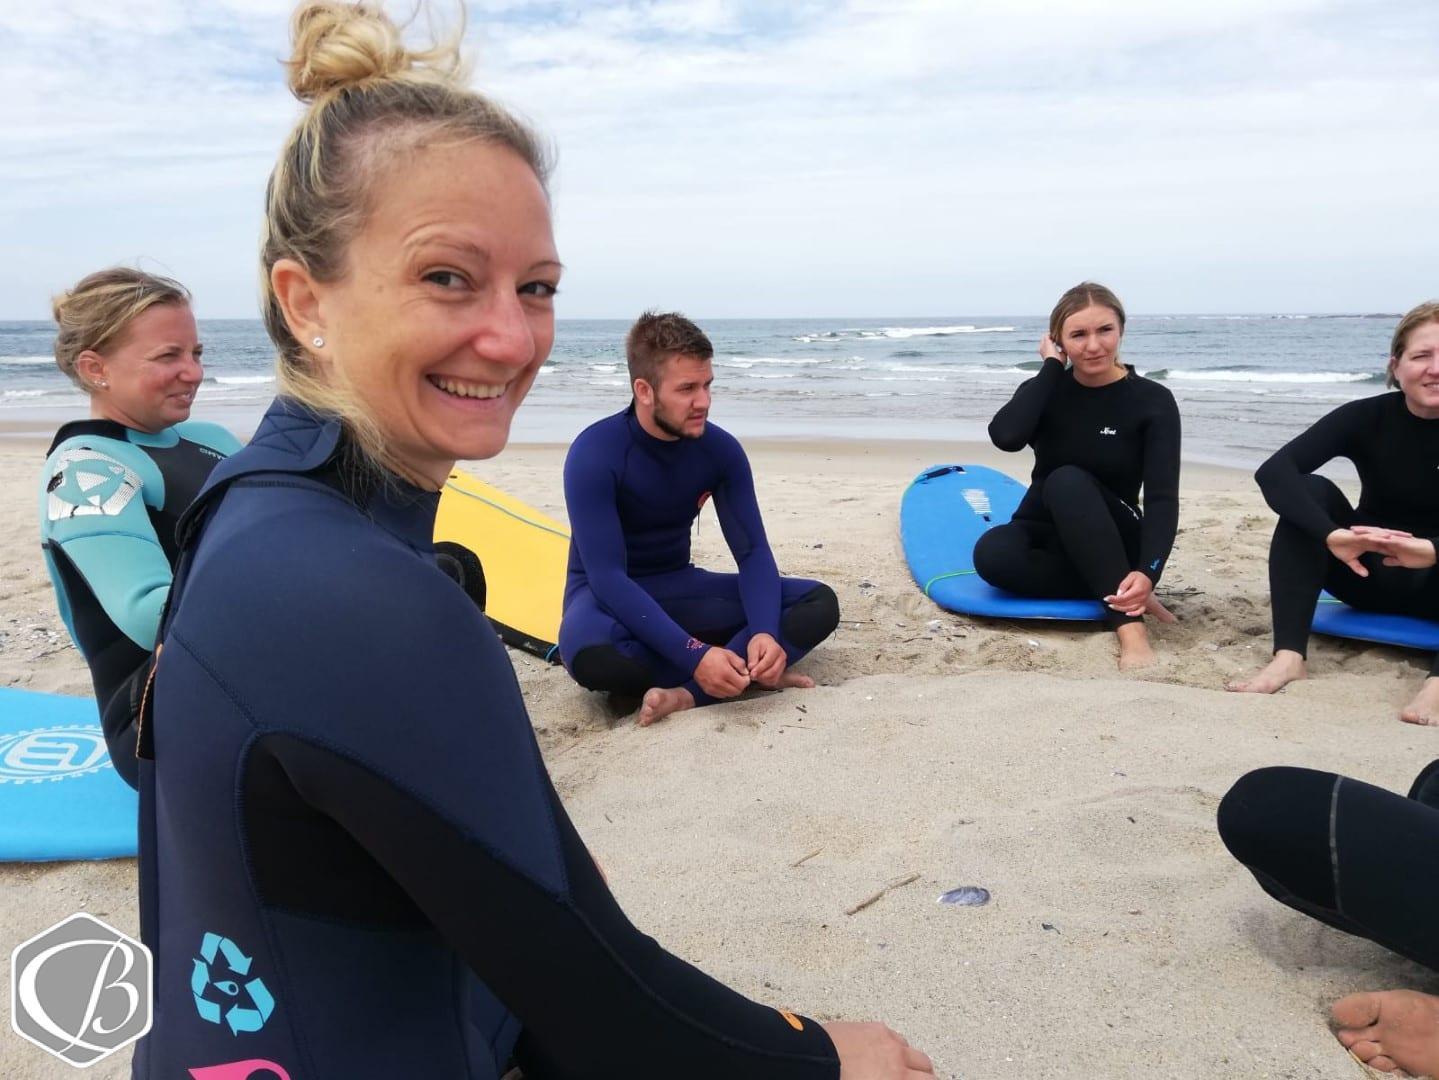 Portugal Moledo Fitnessreise Sporteventwoche Sufen Wellenreiten Meer